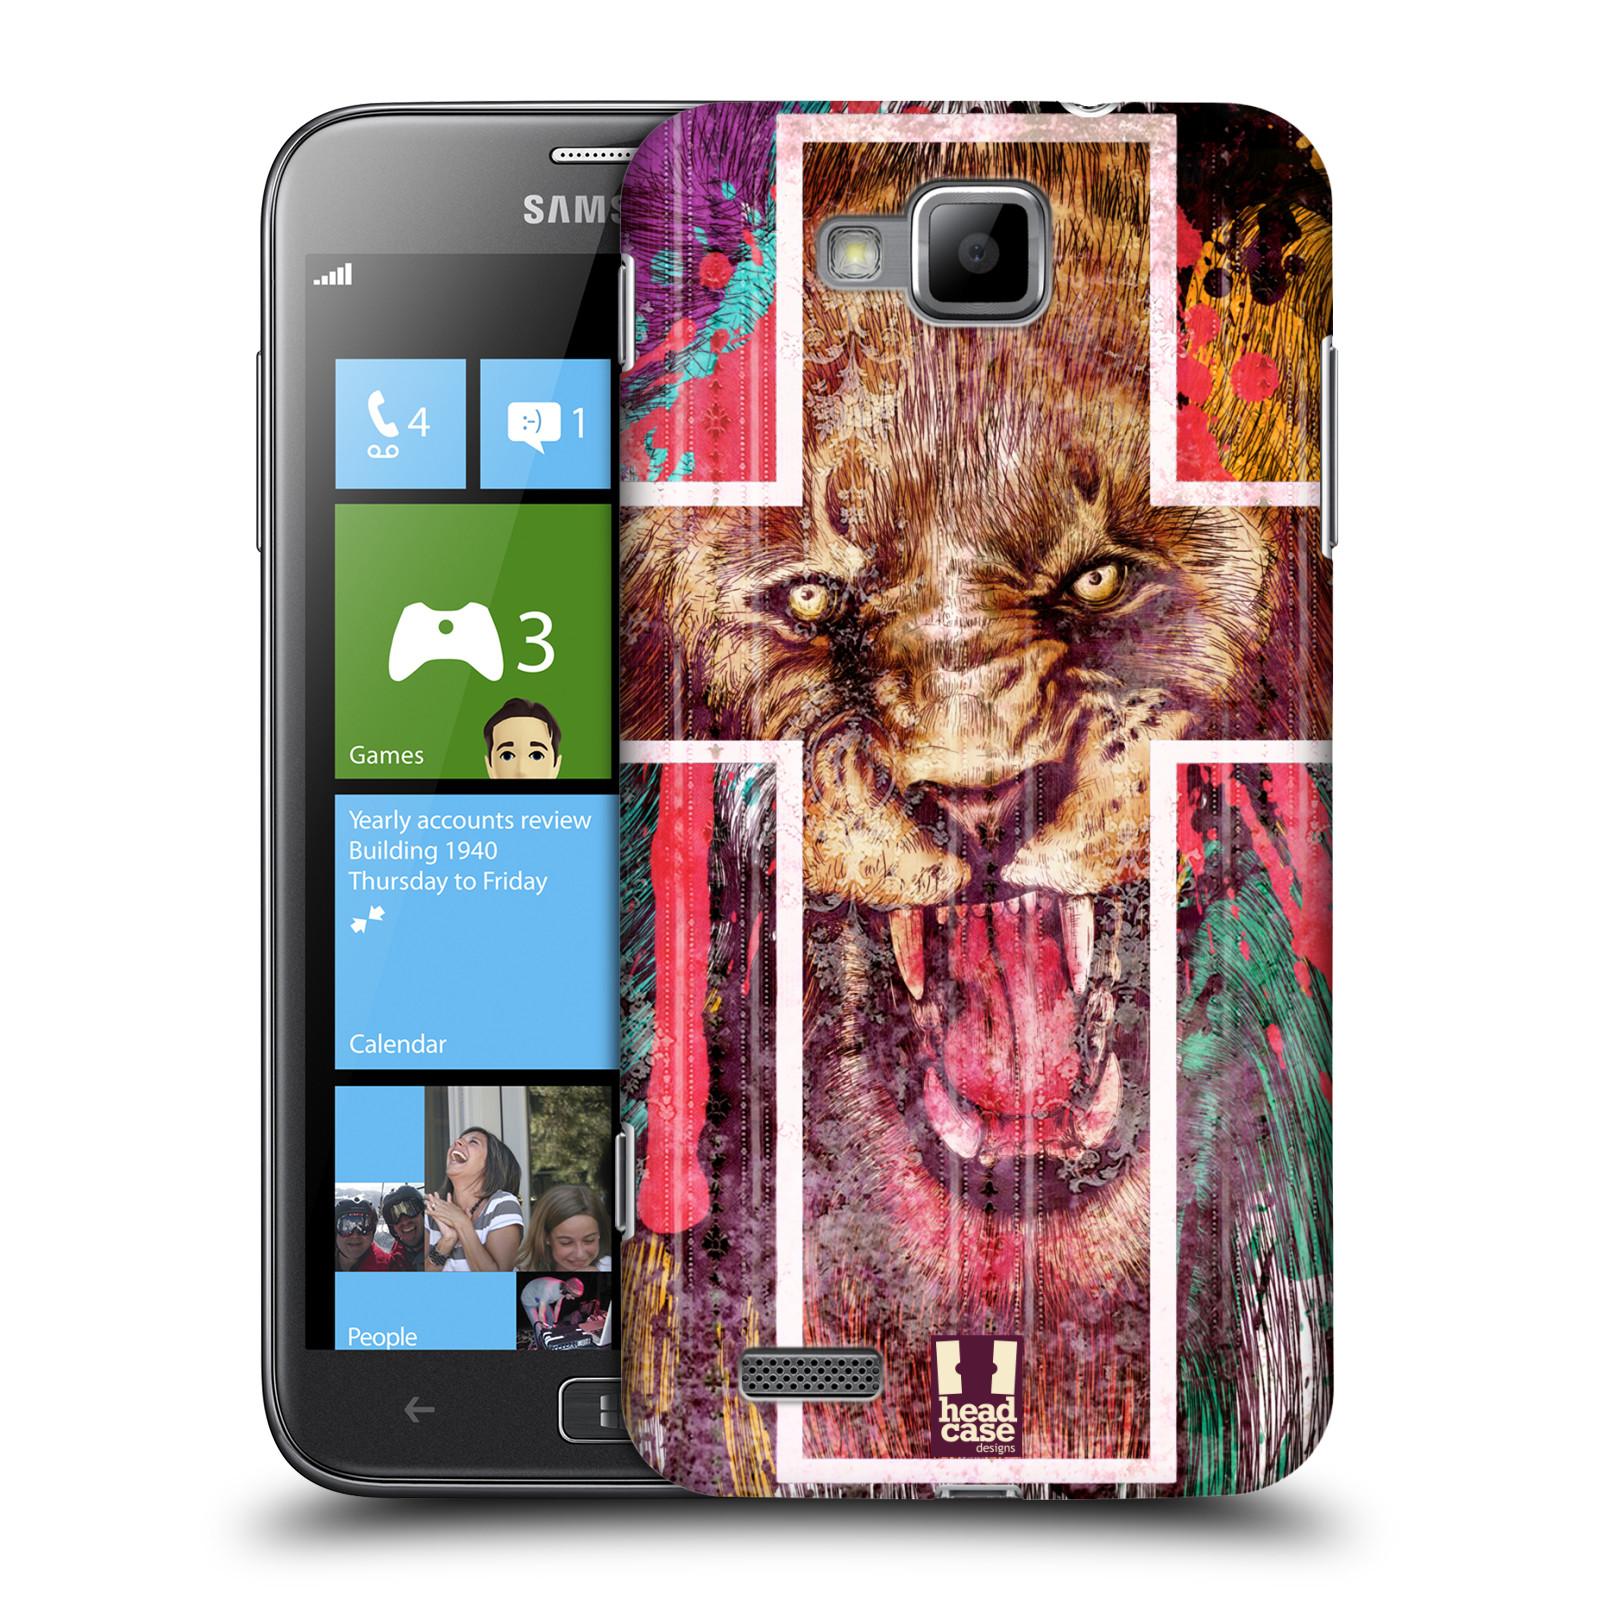 HEAD CASE plastový obal na mobil Samsung ATIV S vzor Kříž a lev